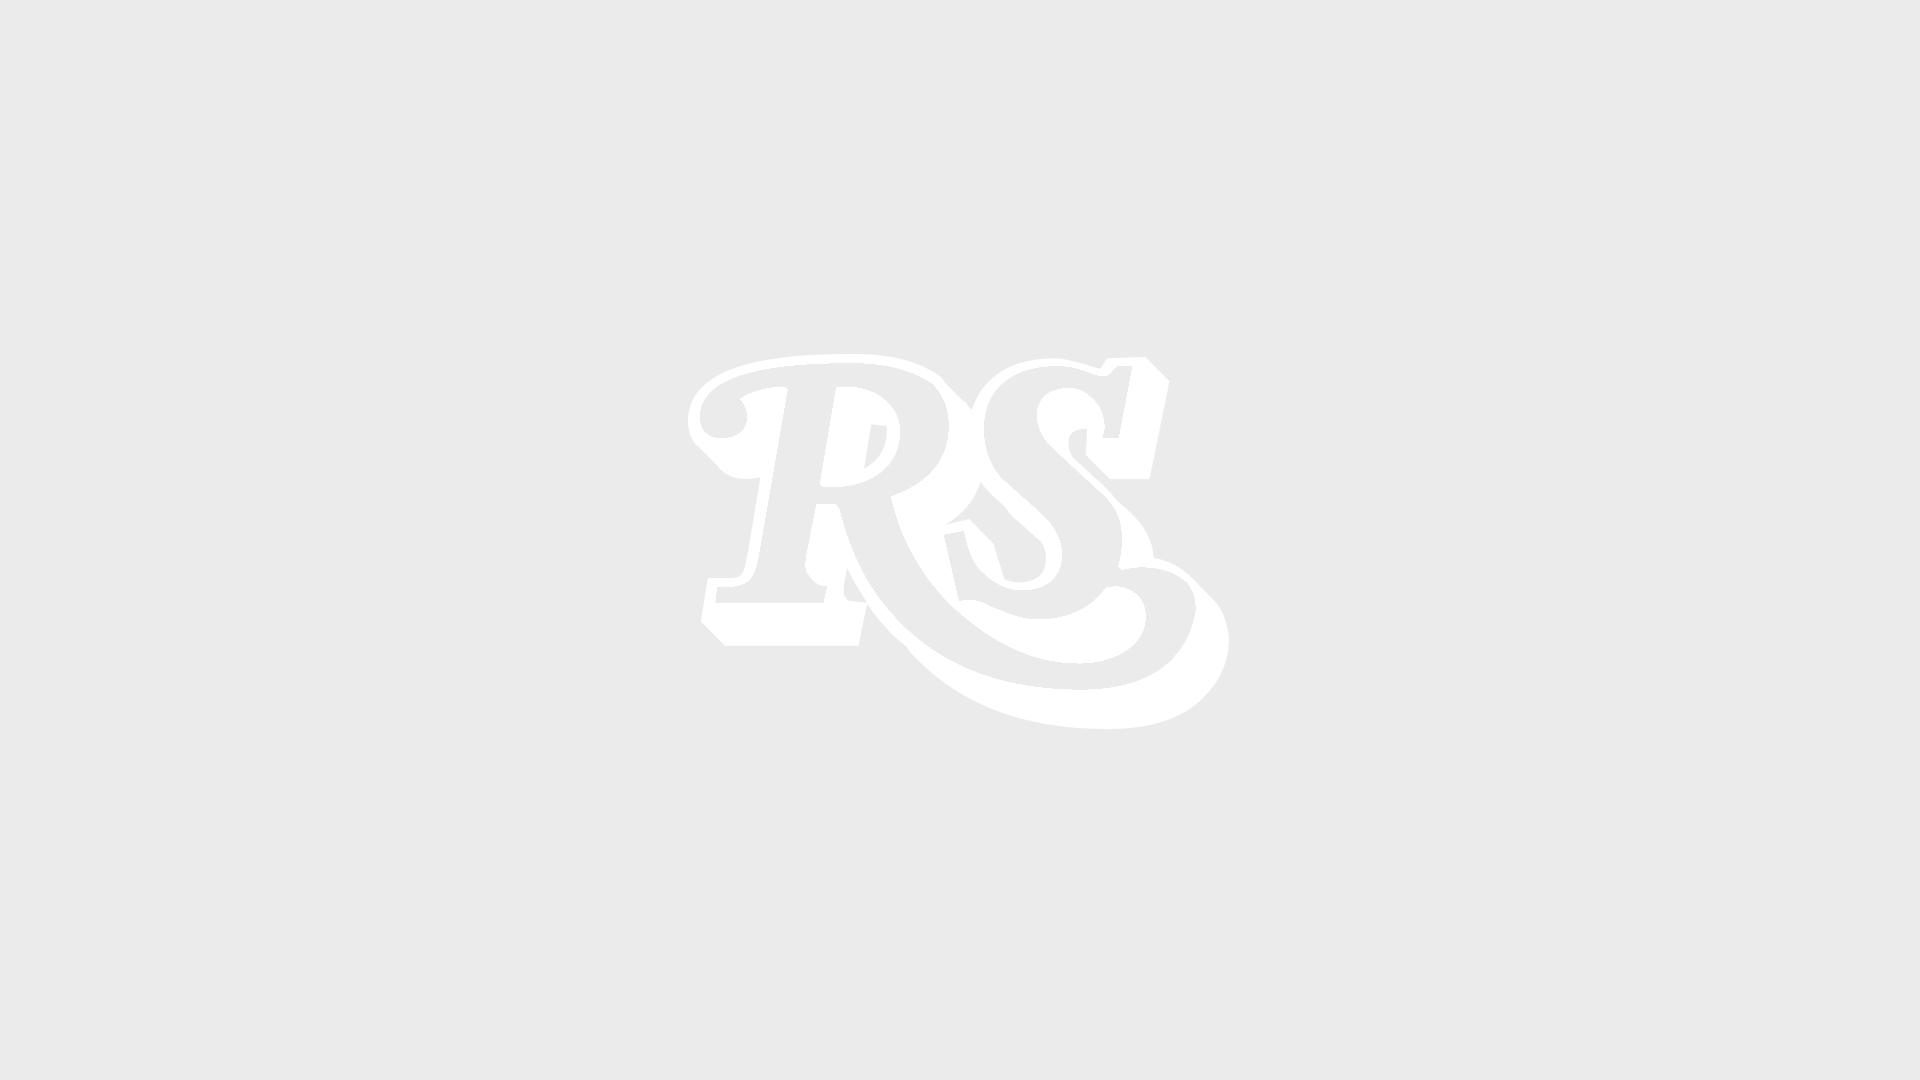 Jeff Beck, Patti LaBelle, Ravi Shankar und Anoushka Shankar